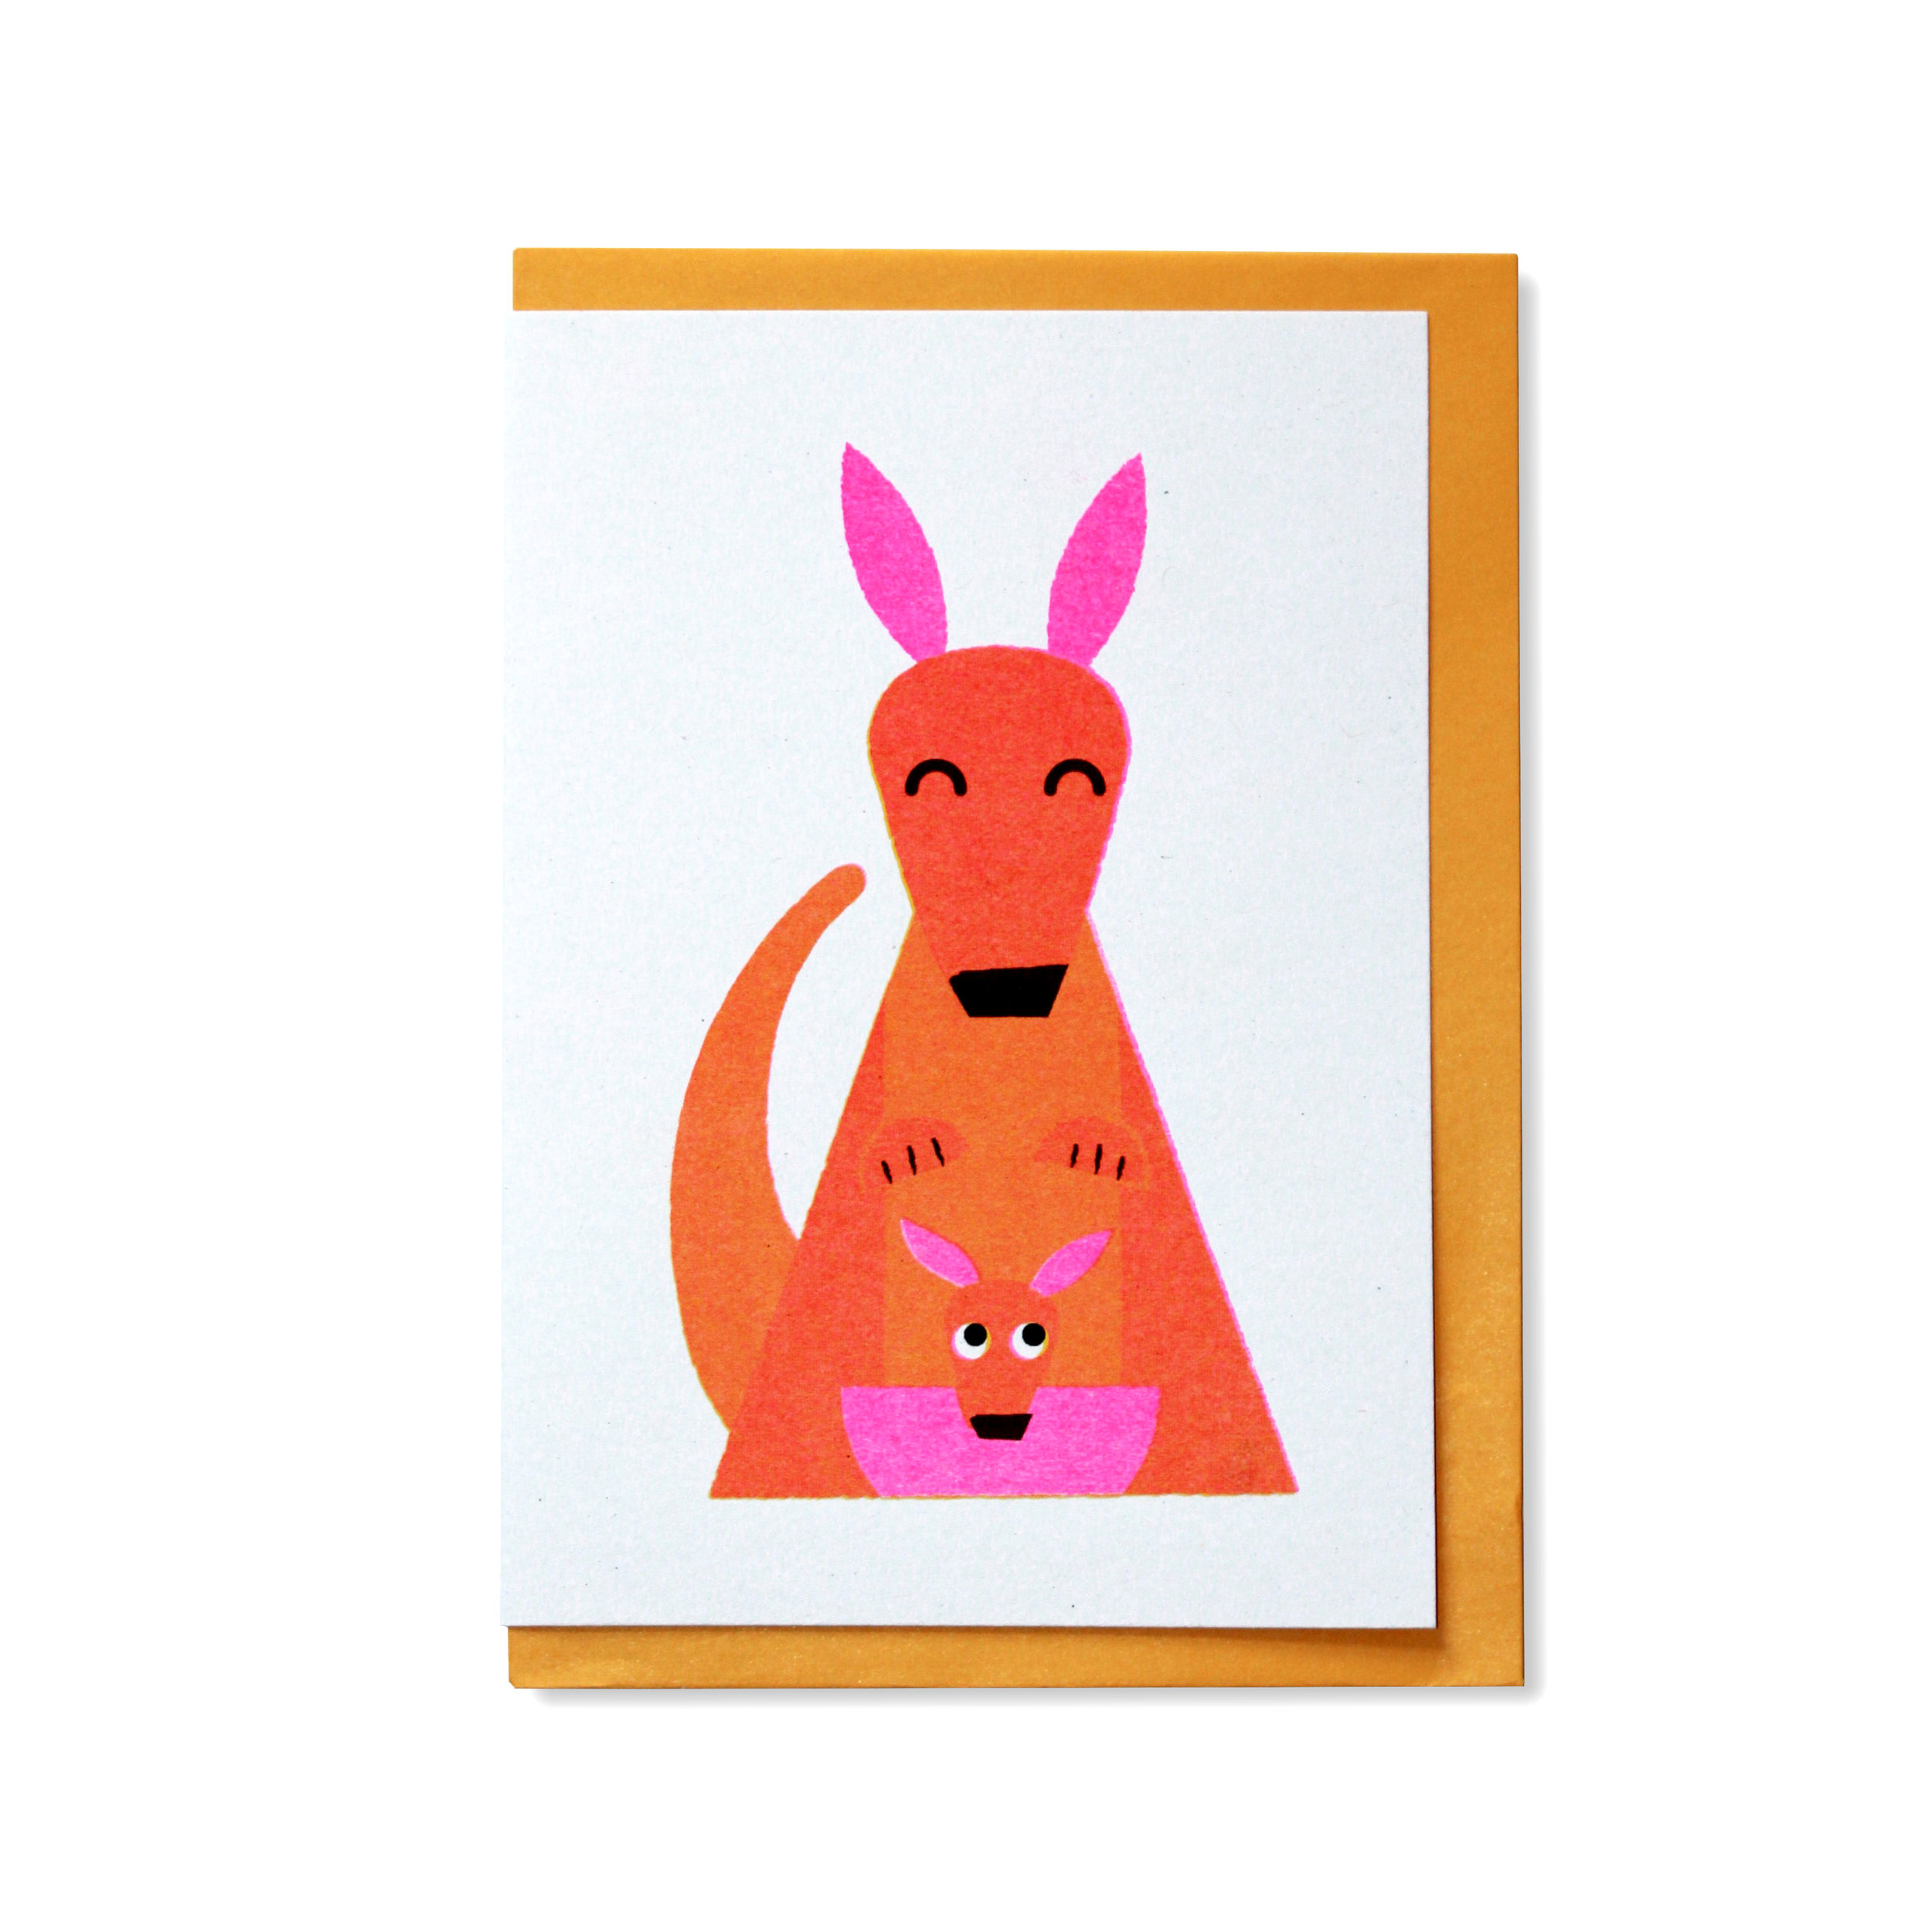 Kangaroo-Joey.jpg